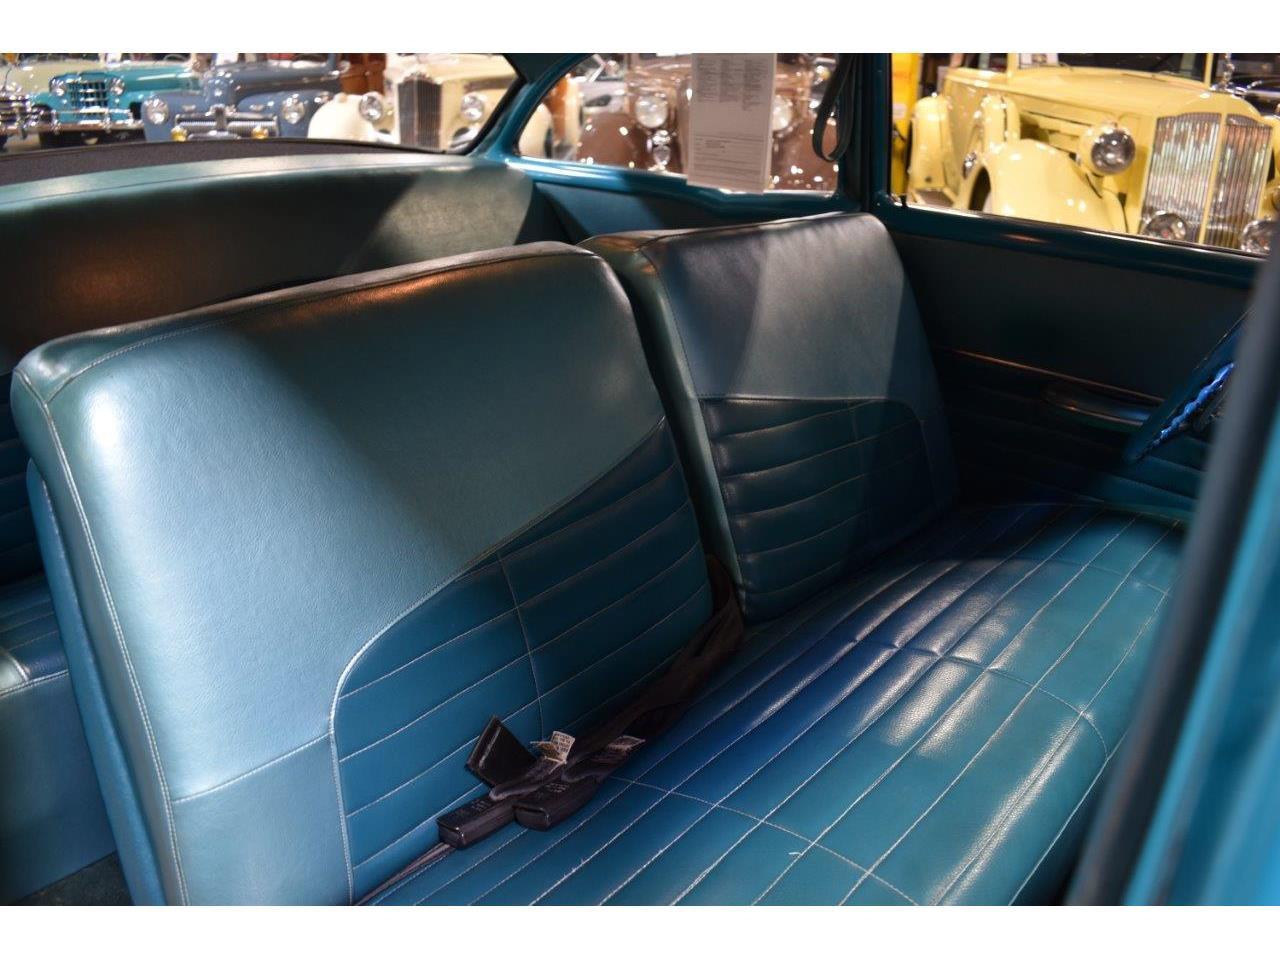 Large Picture of '56 Bel Air located in Costa Mesa California - $19,900.00 - Q5GK